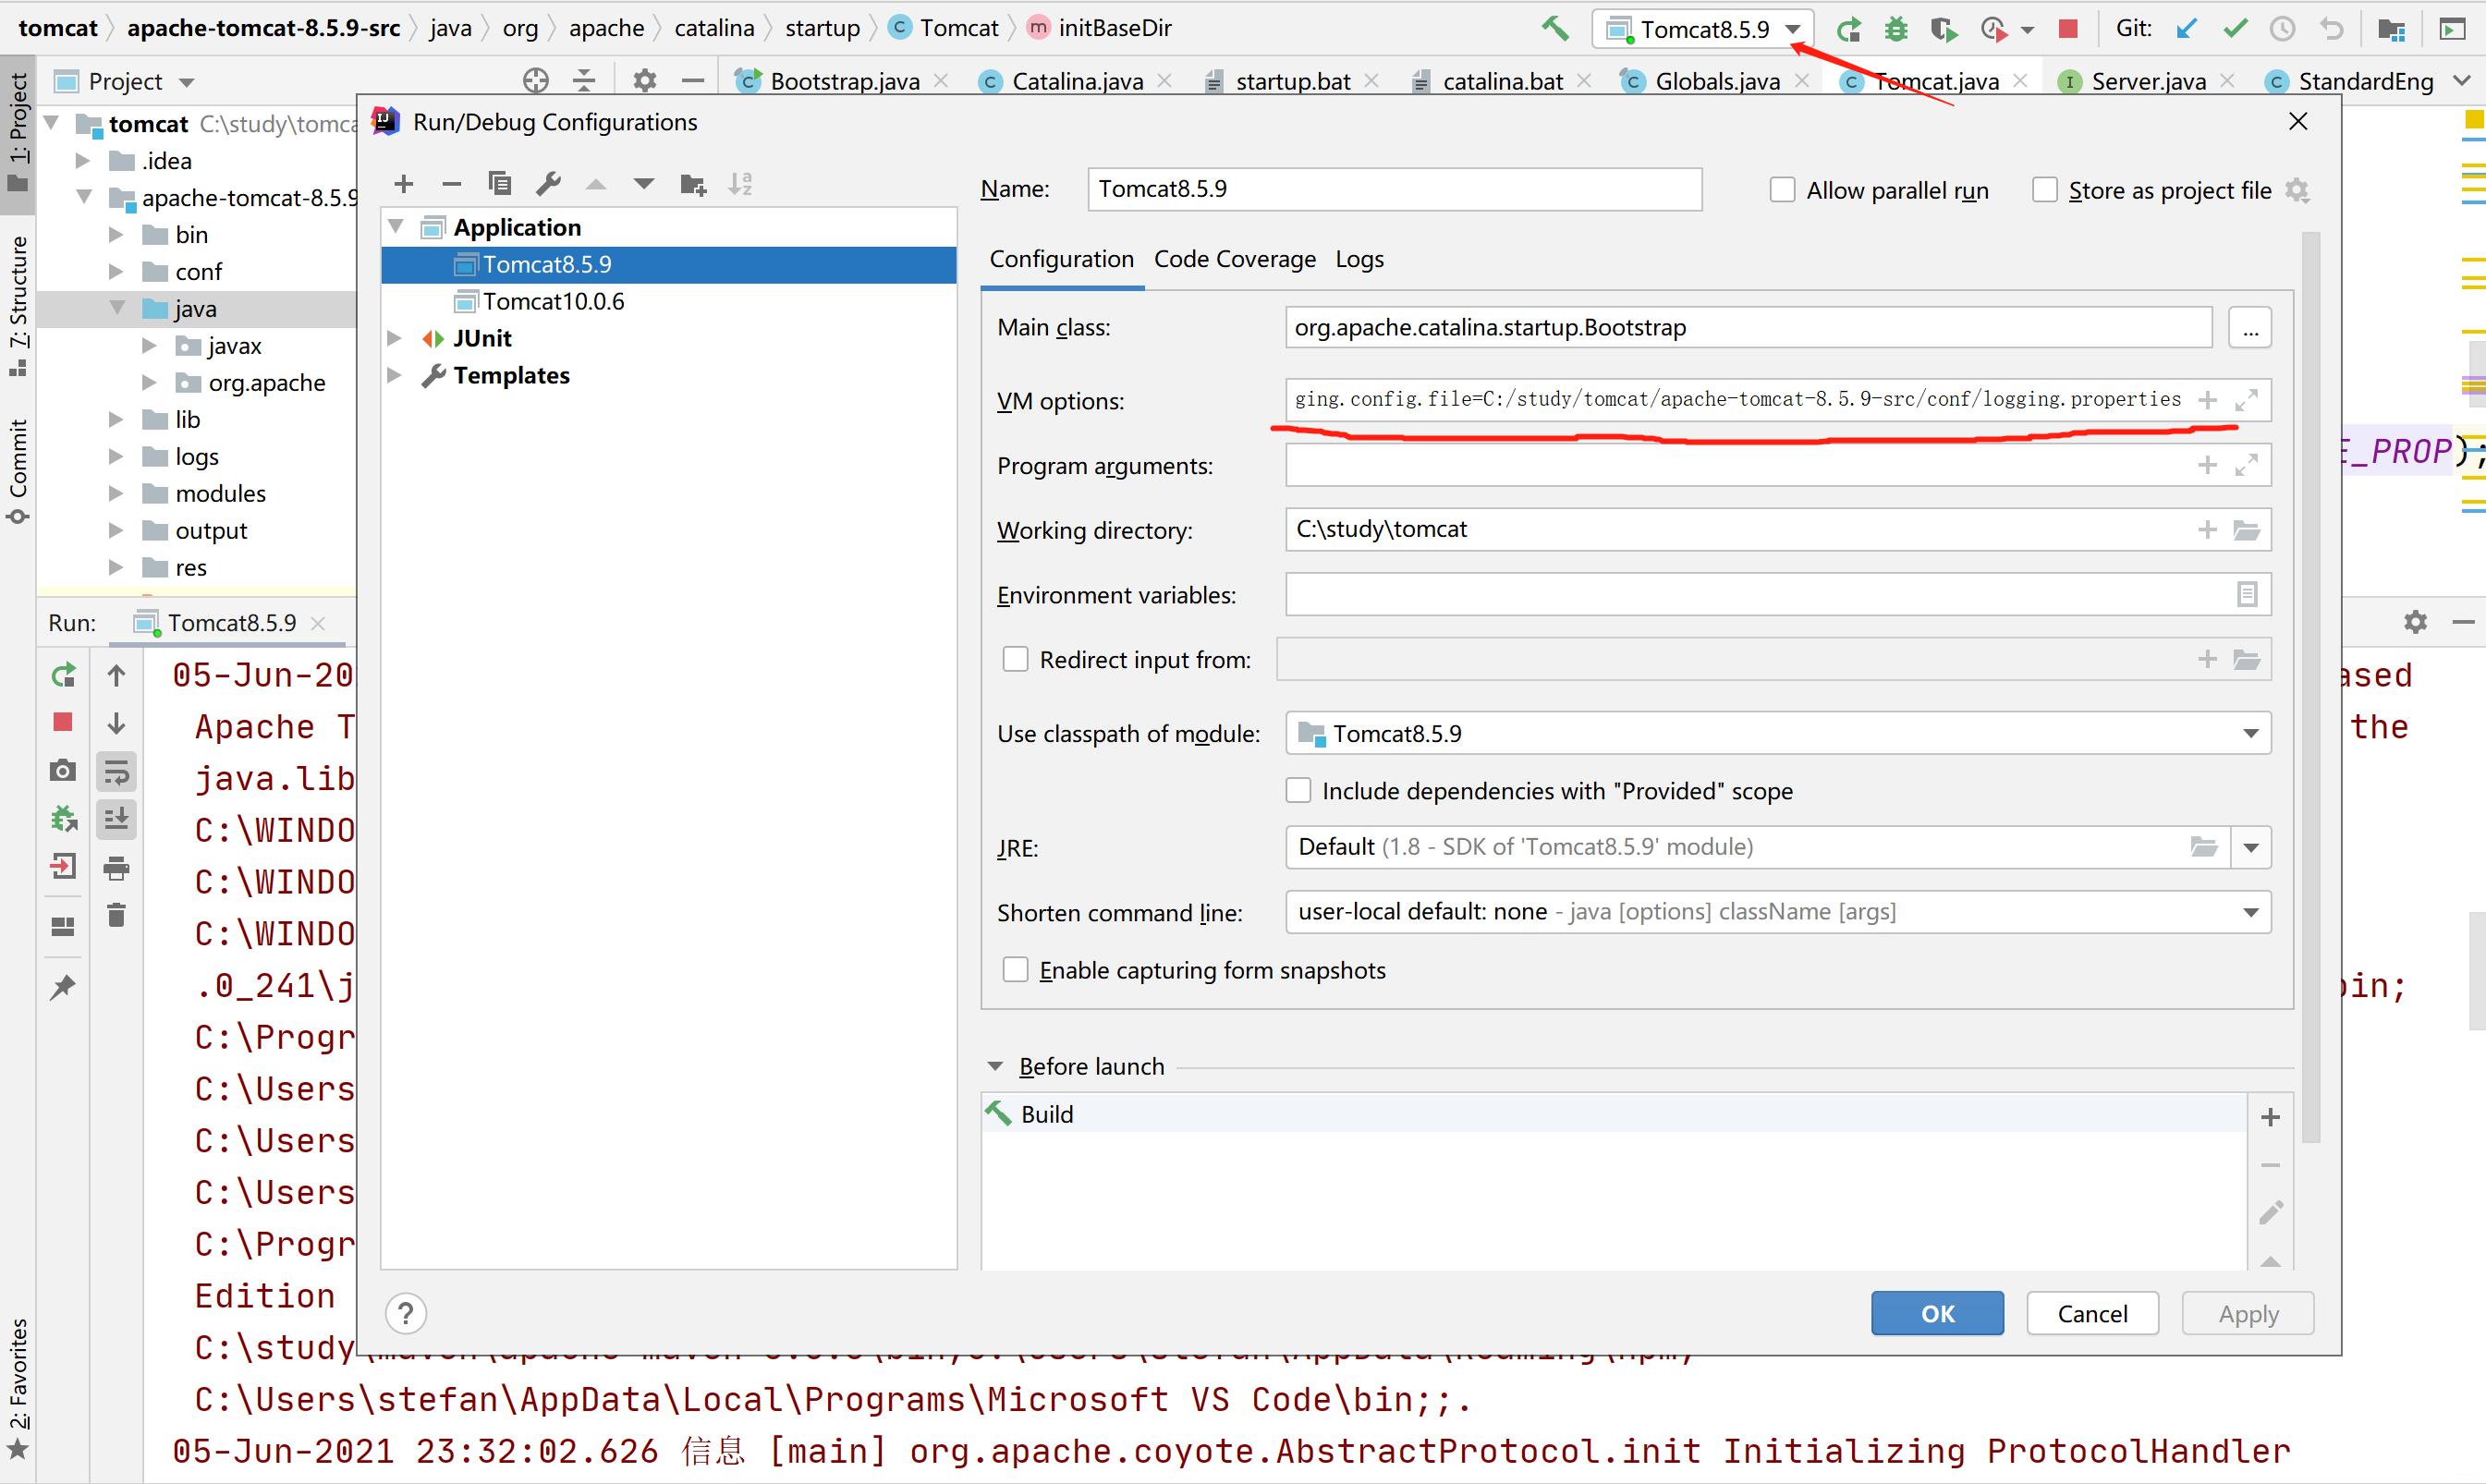 Edit Configurations...